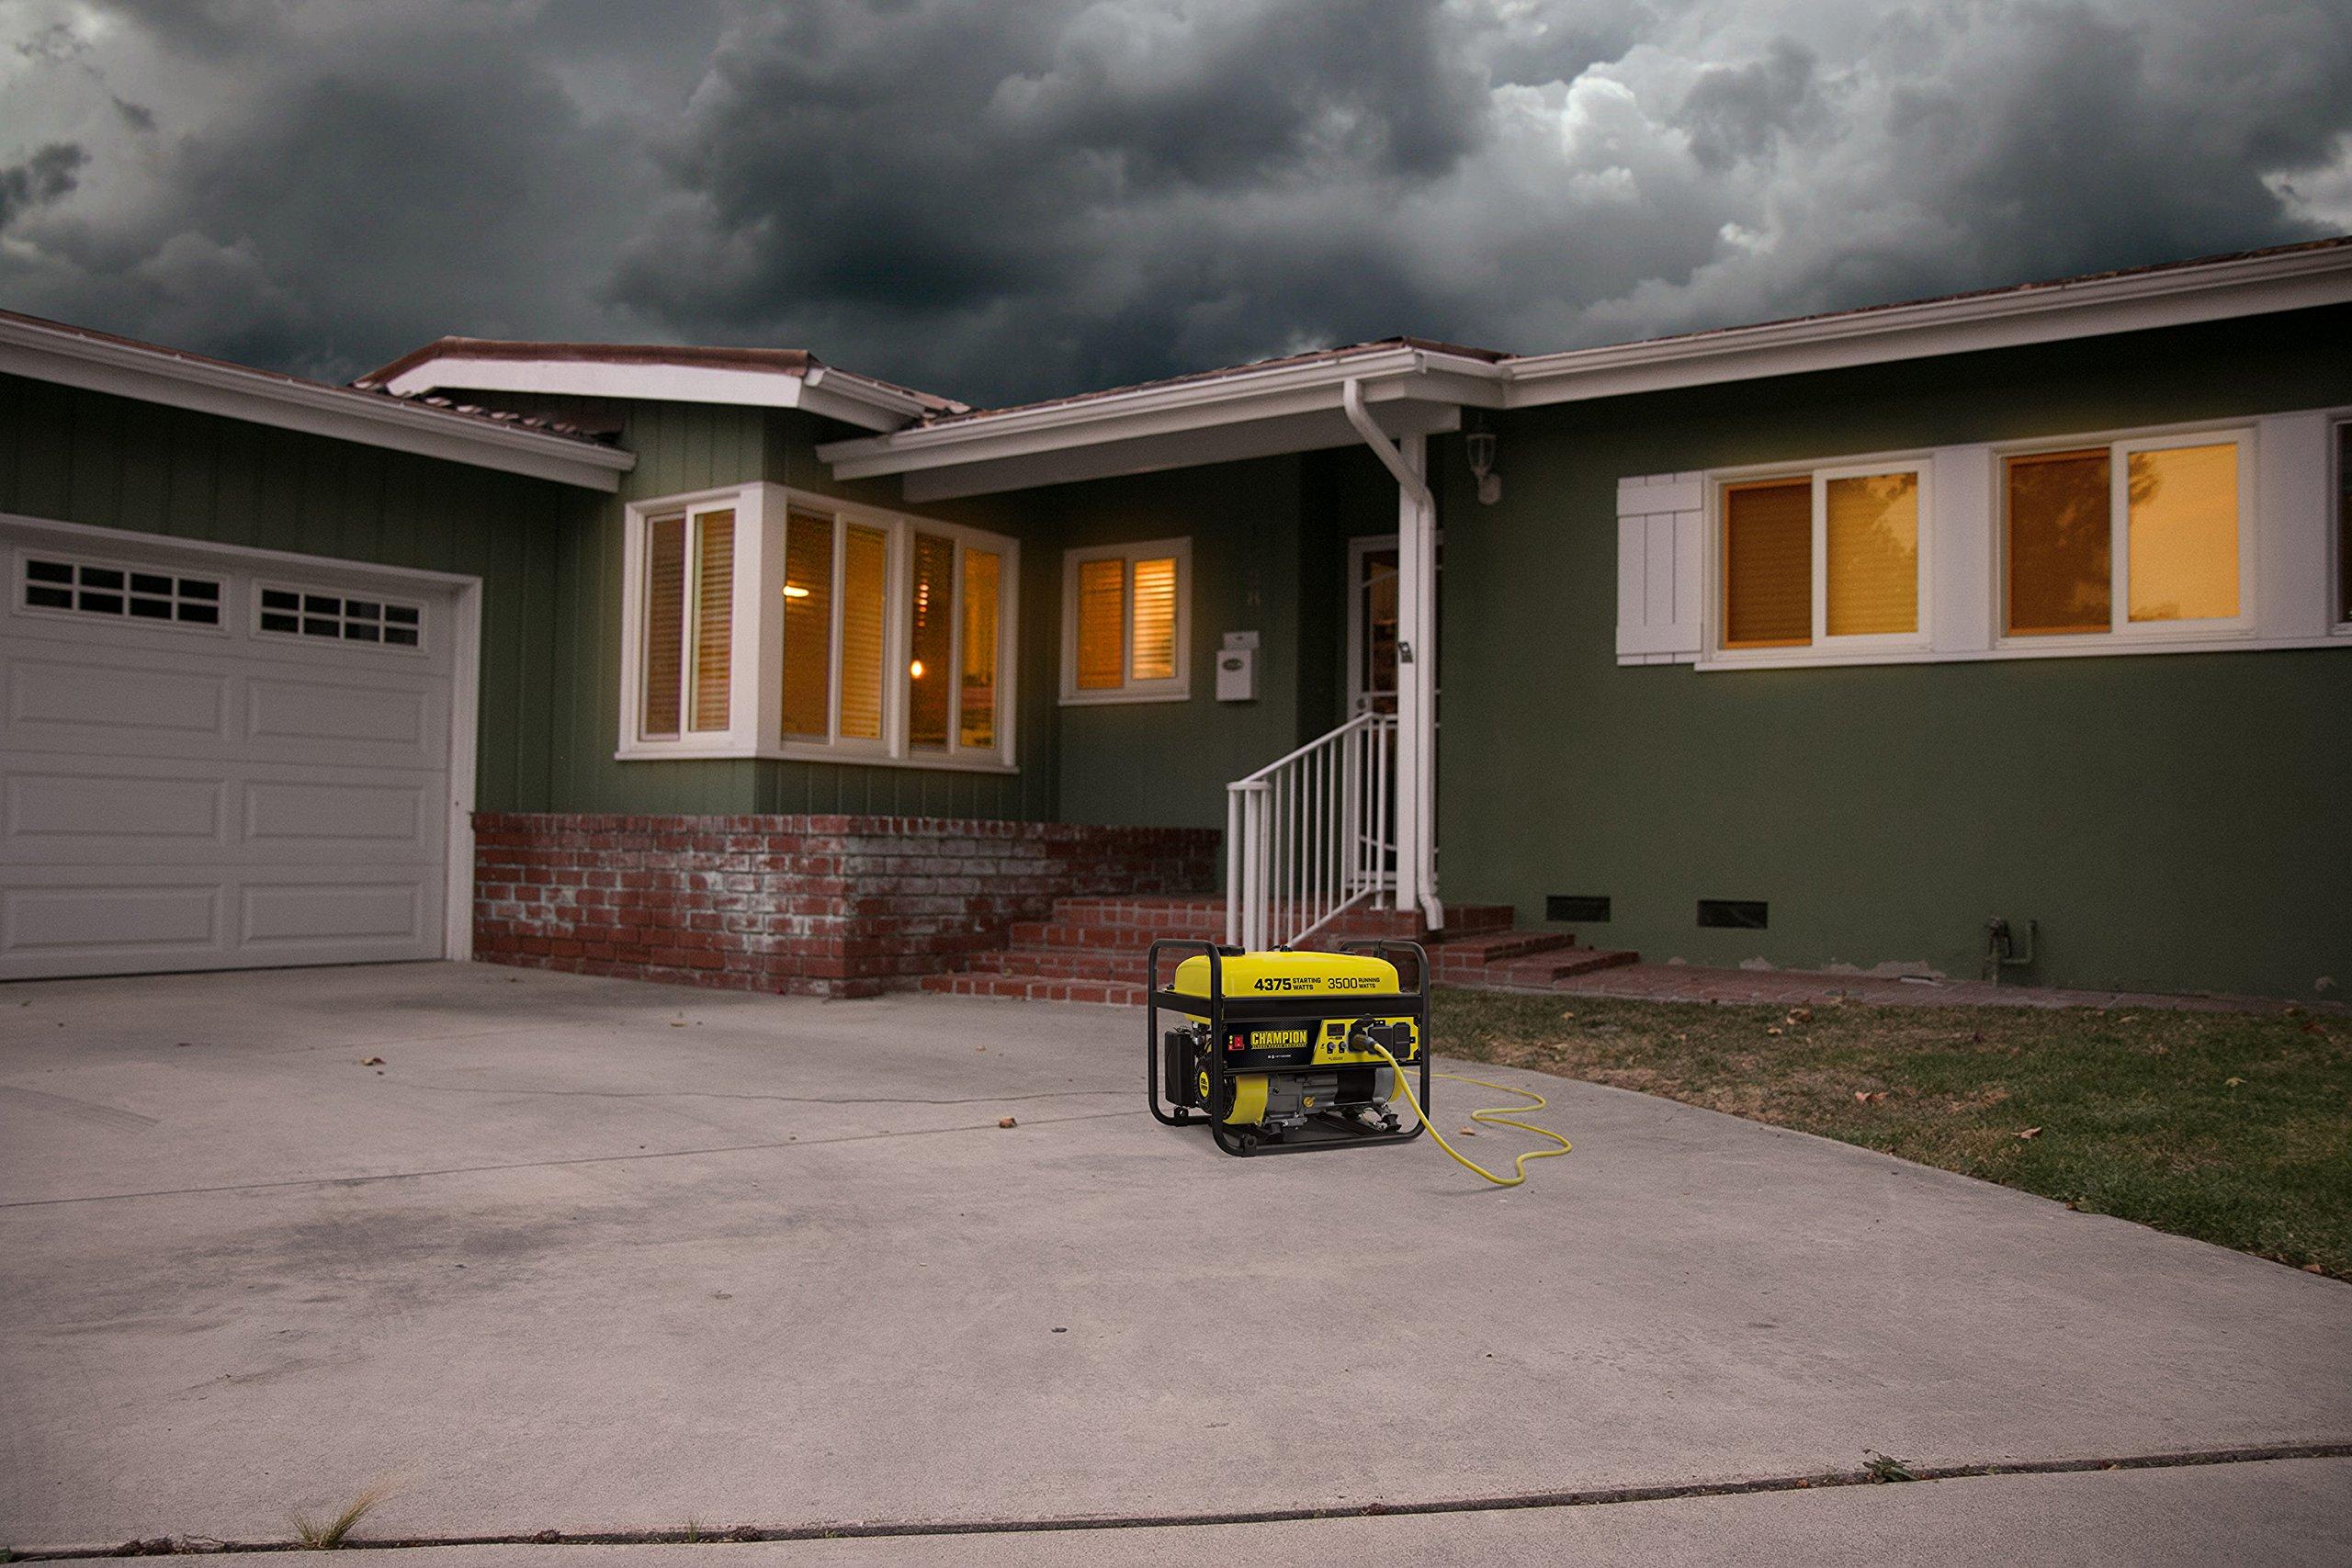 Champion Power Equipment 100555 RV Ready Portable Generator, Yellow and Black by Champion Power Equipment (Image #2)